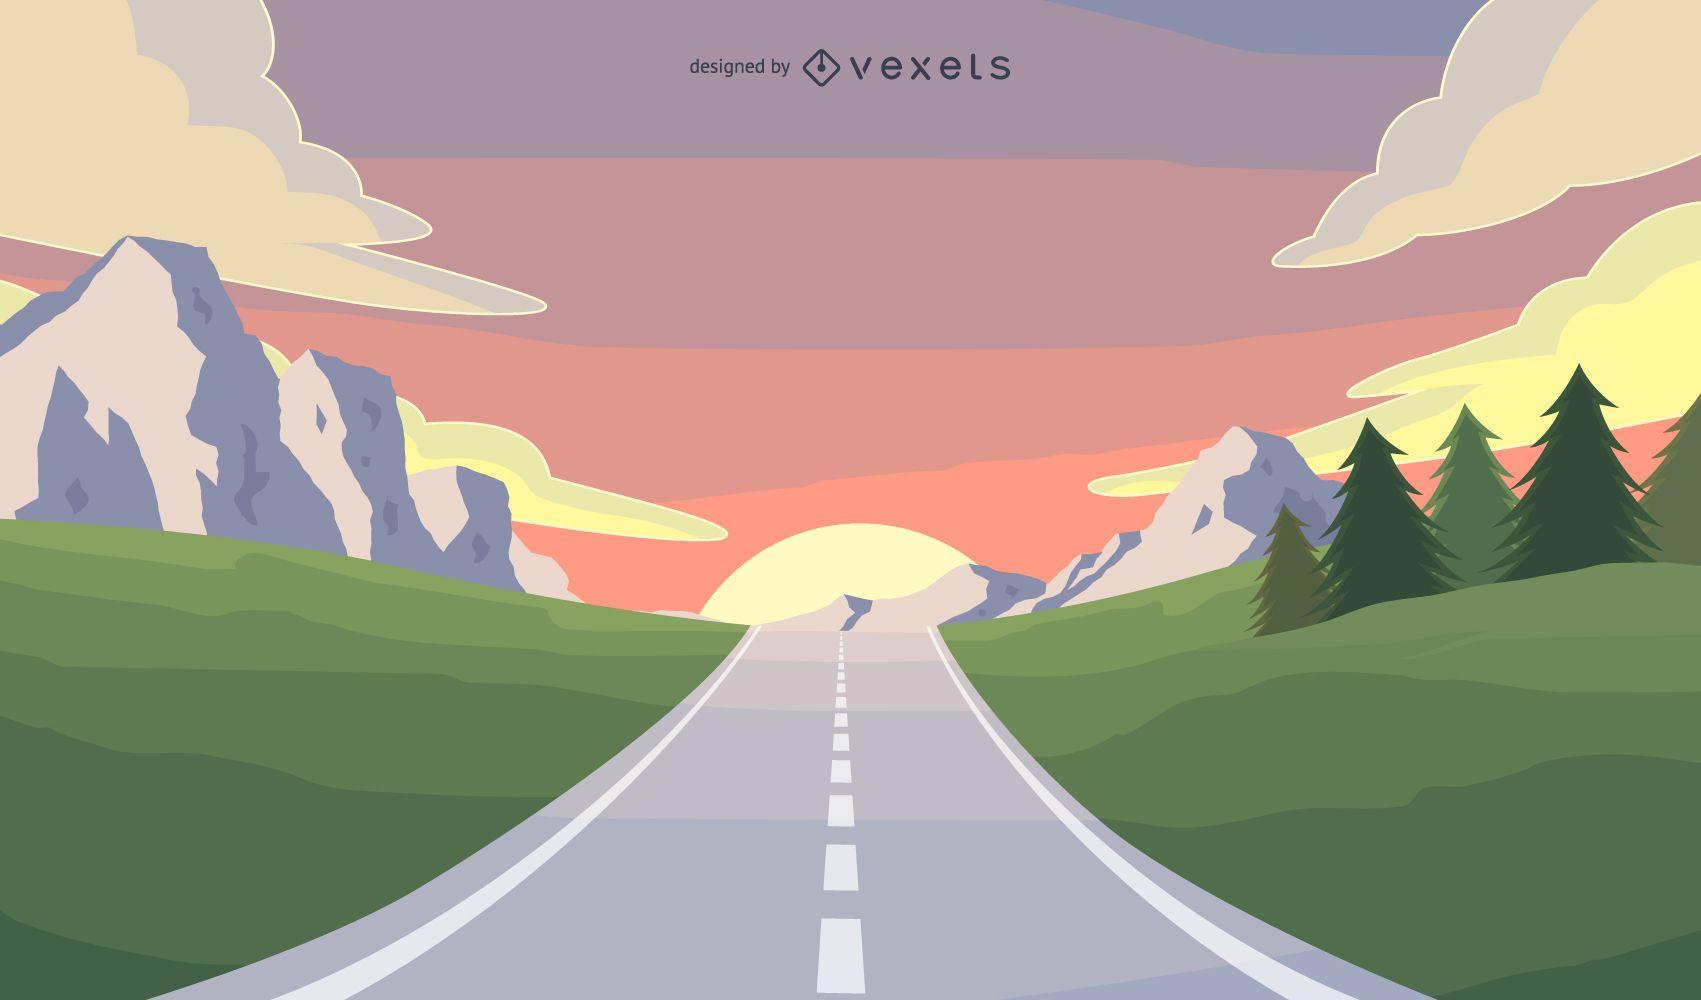 Road travel illustration